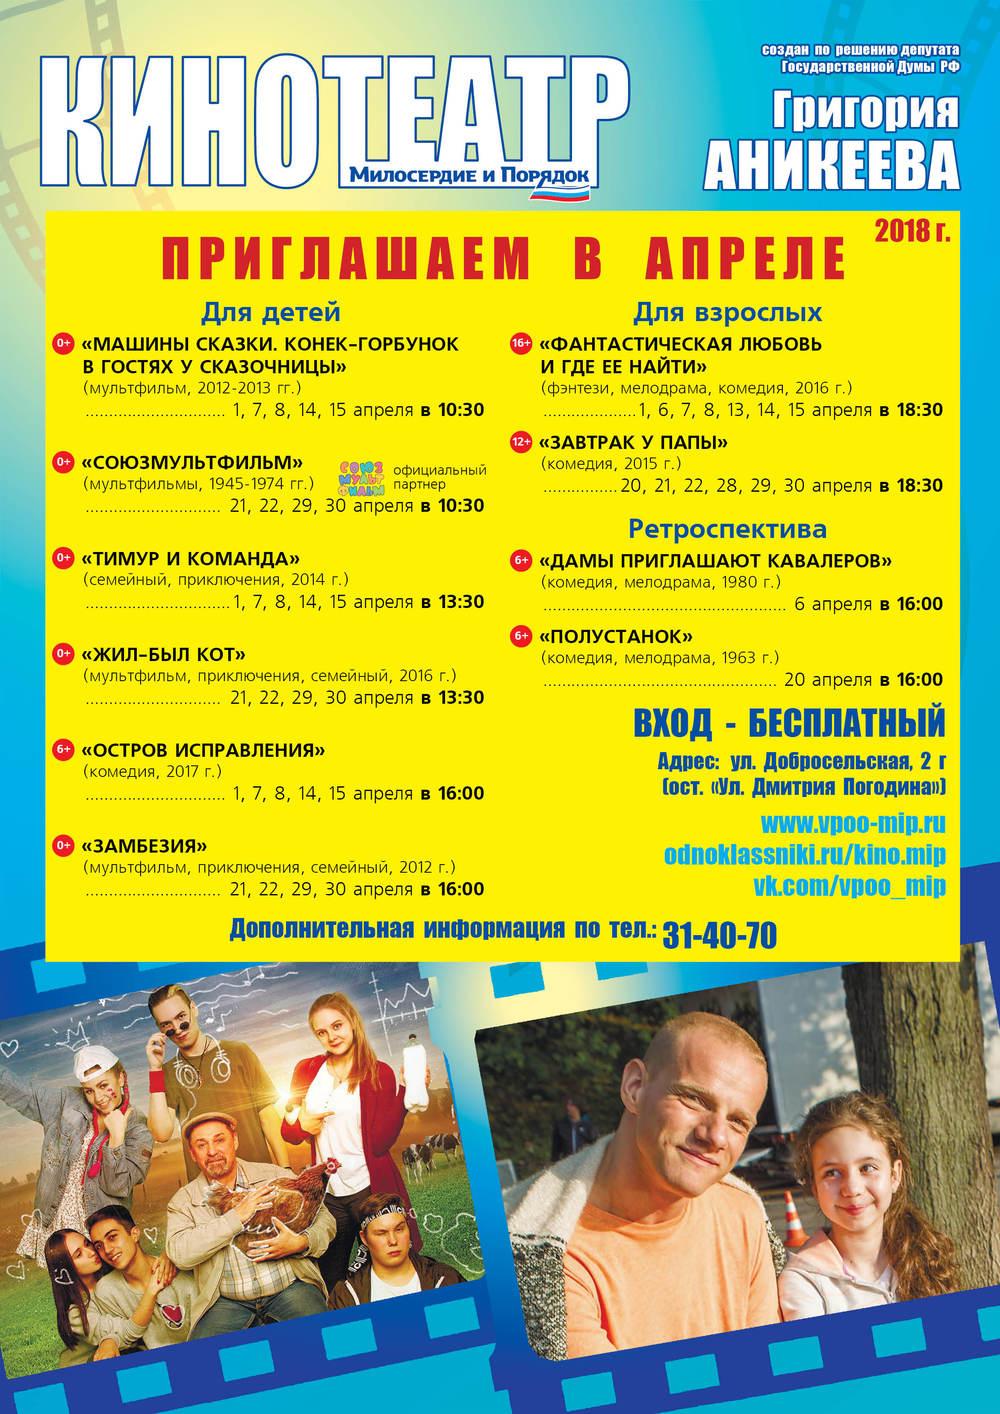 Владимирский областной театр афиша на билеты на концерт на завтра